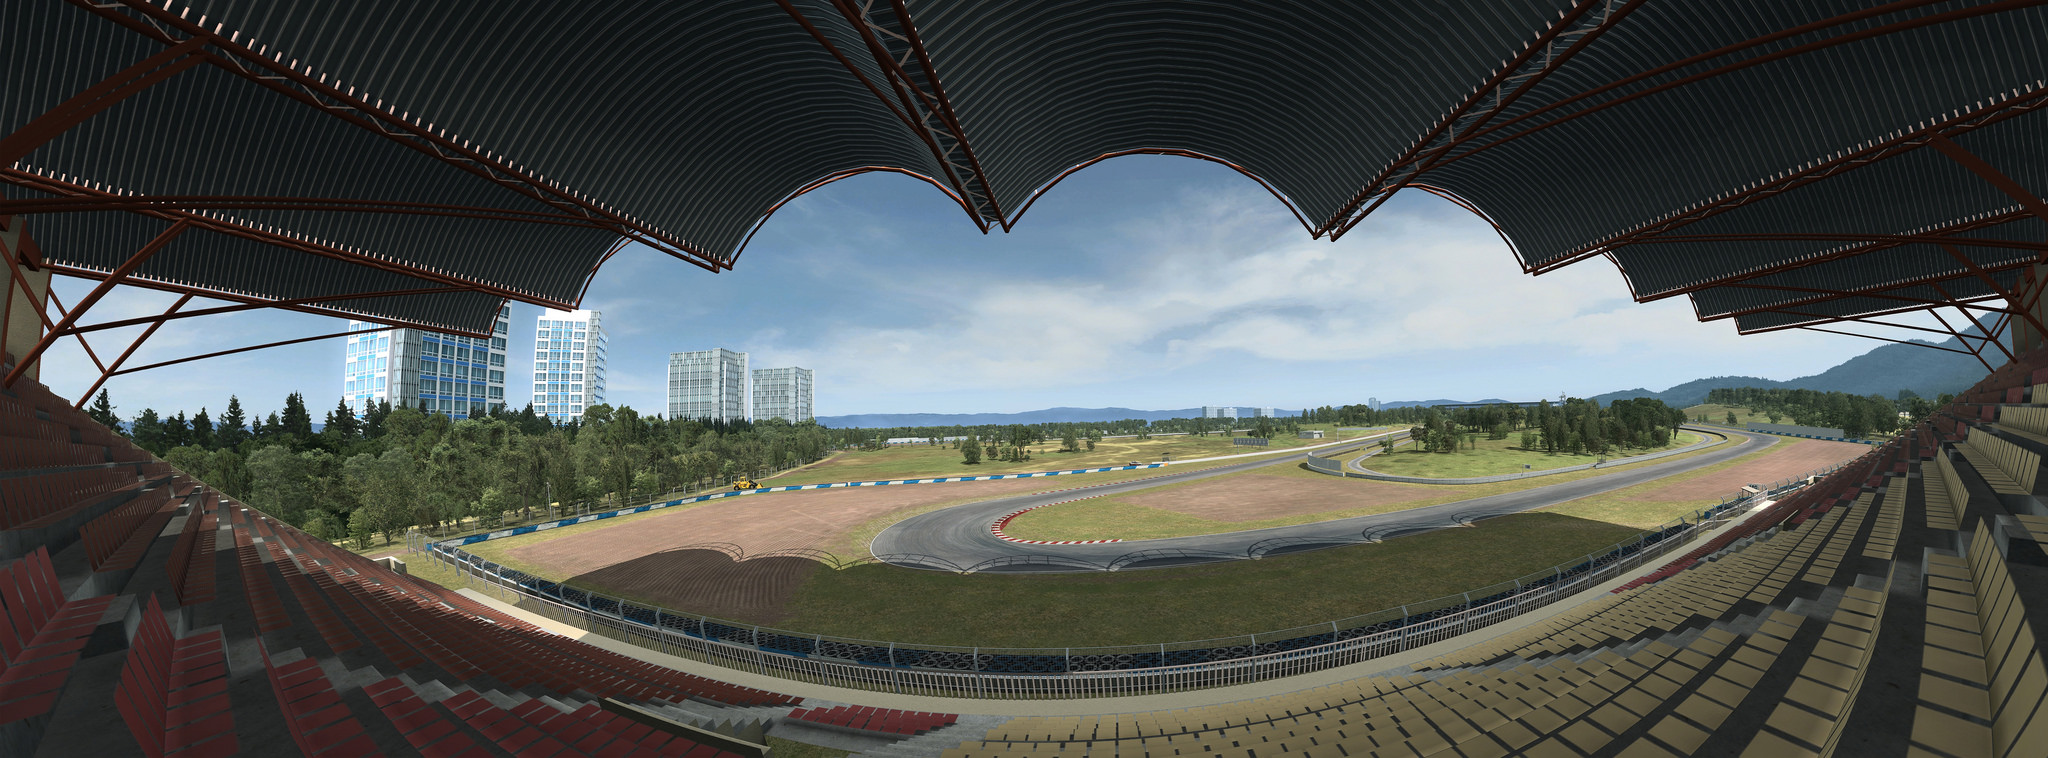 RaceRoom Zhuhai International Circuit 2.jpg